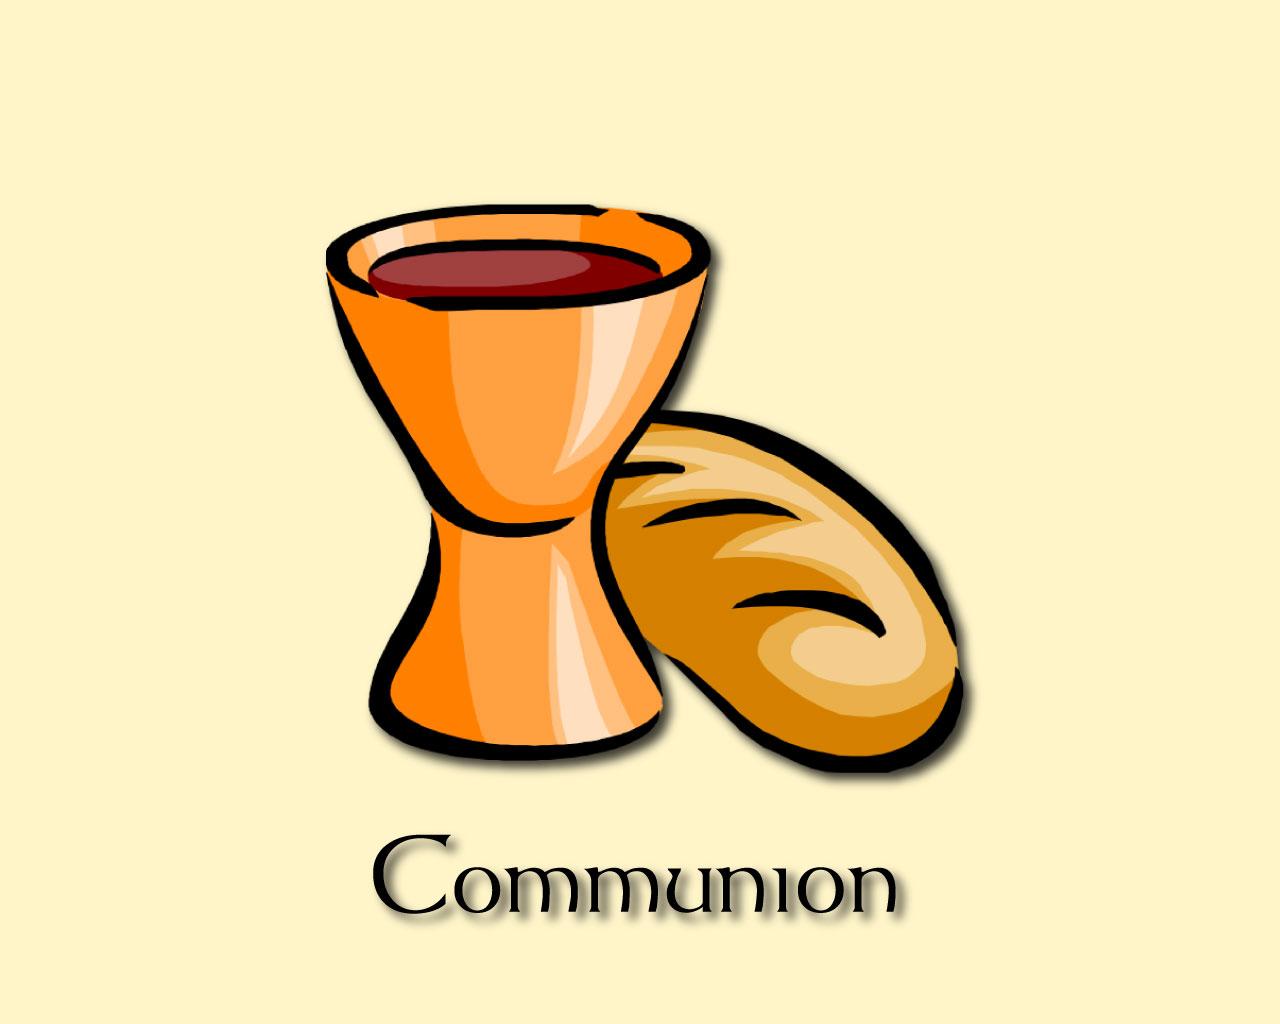 SUNDAY, NOVEMBER 27 | Cedonia Community Church